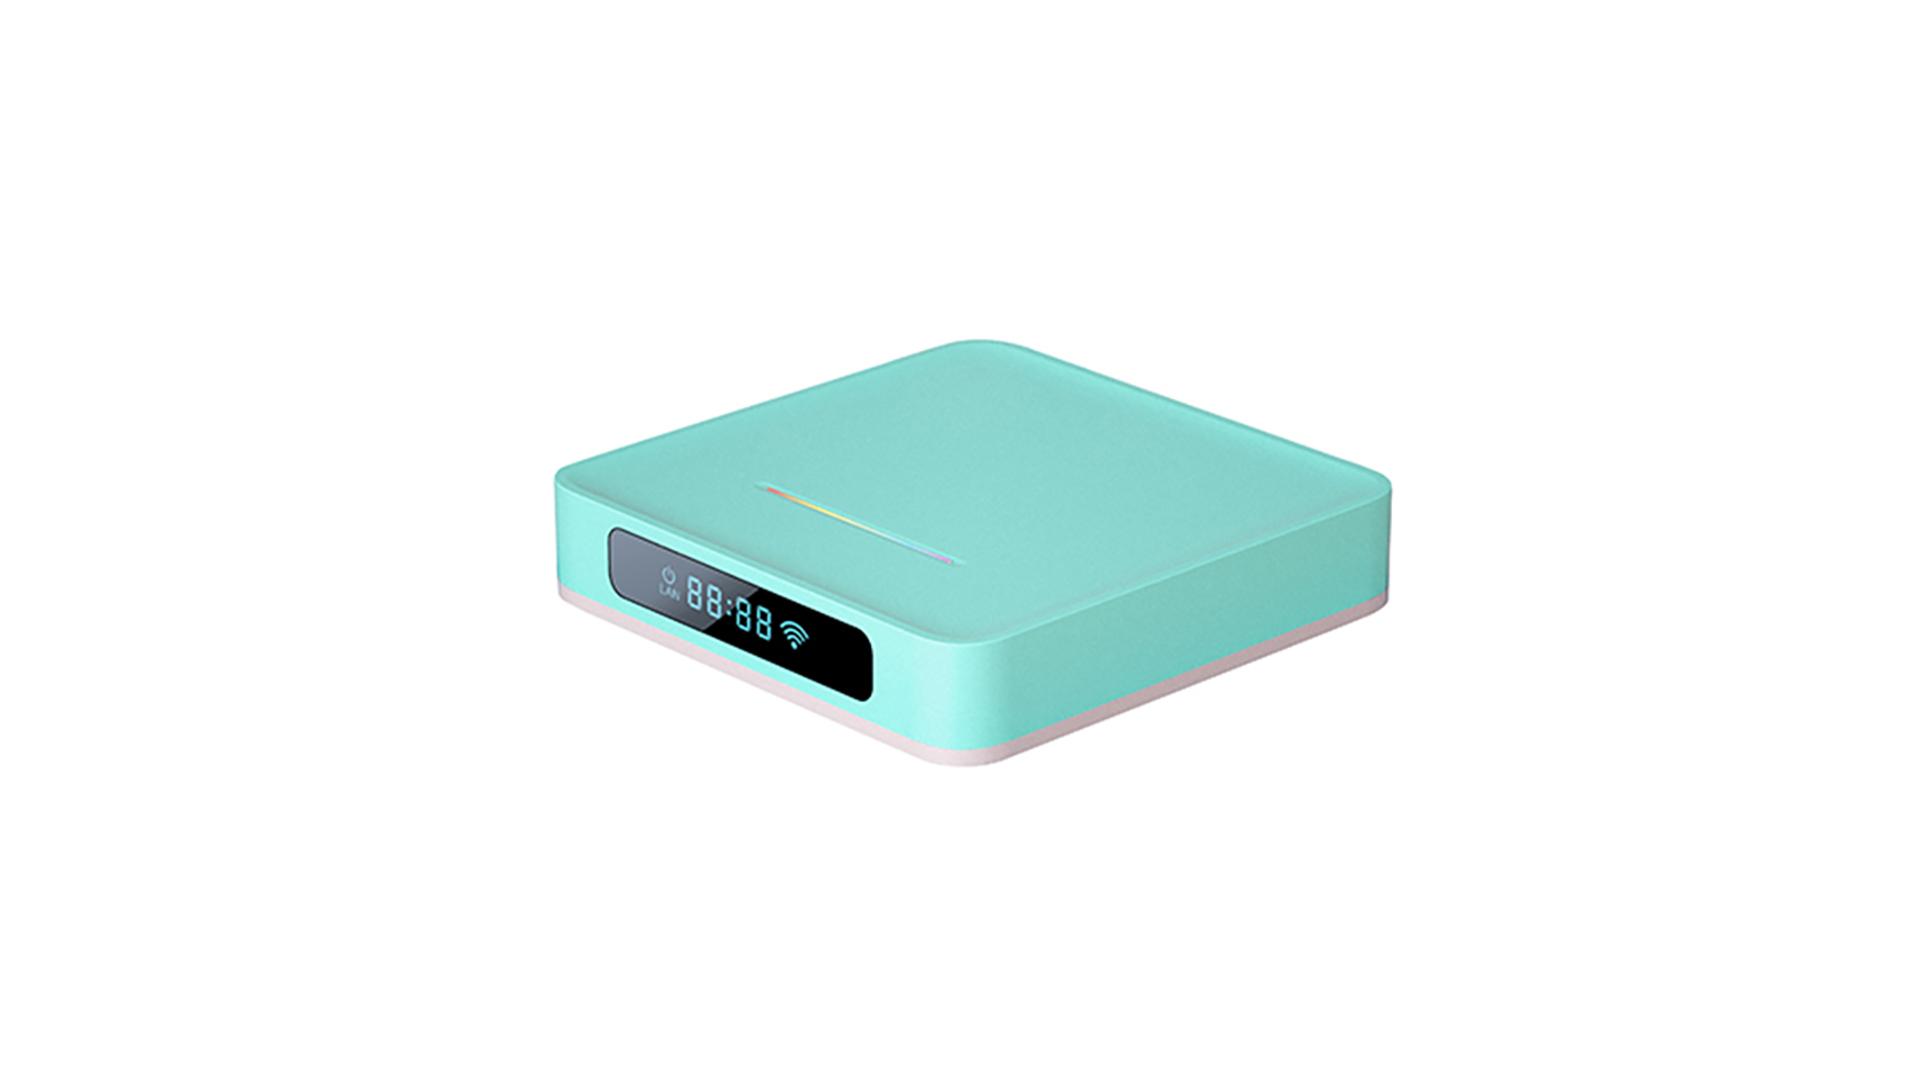 Utocin Quad-core Cortex-A53 1.1GHz Android TV box A95X R5 Rockchip RK3318 Mali 450 GPU